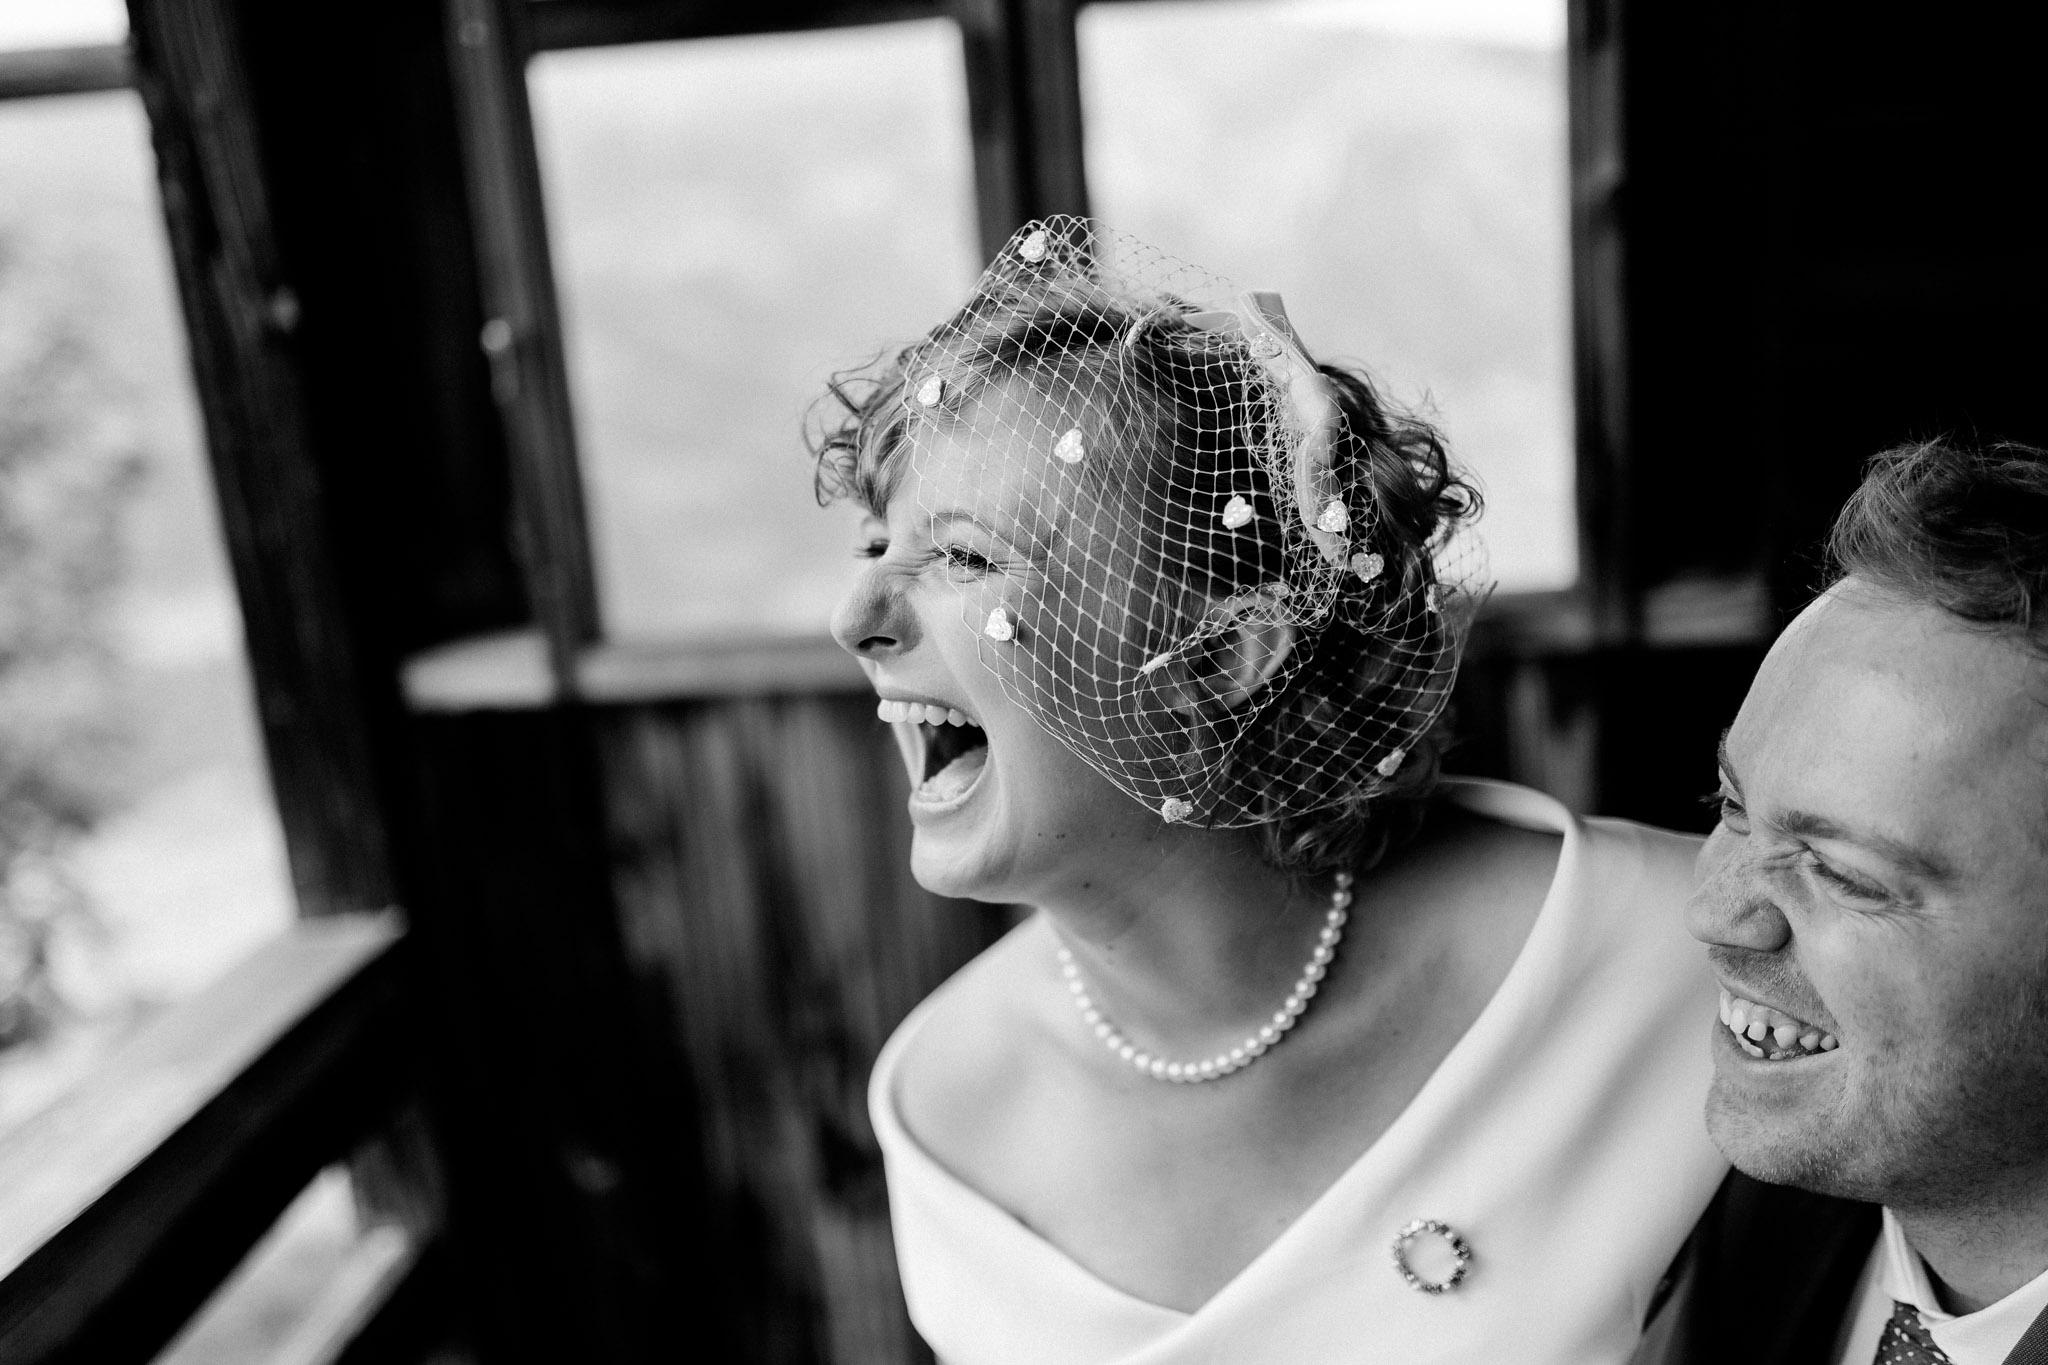 Lenl-Simmental-Buehlerhof-Pia-Anna-Christian-Wedding-Photography-EK-46.jpg